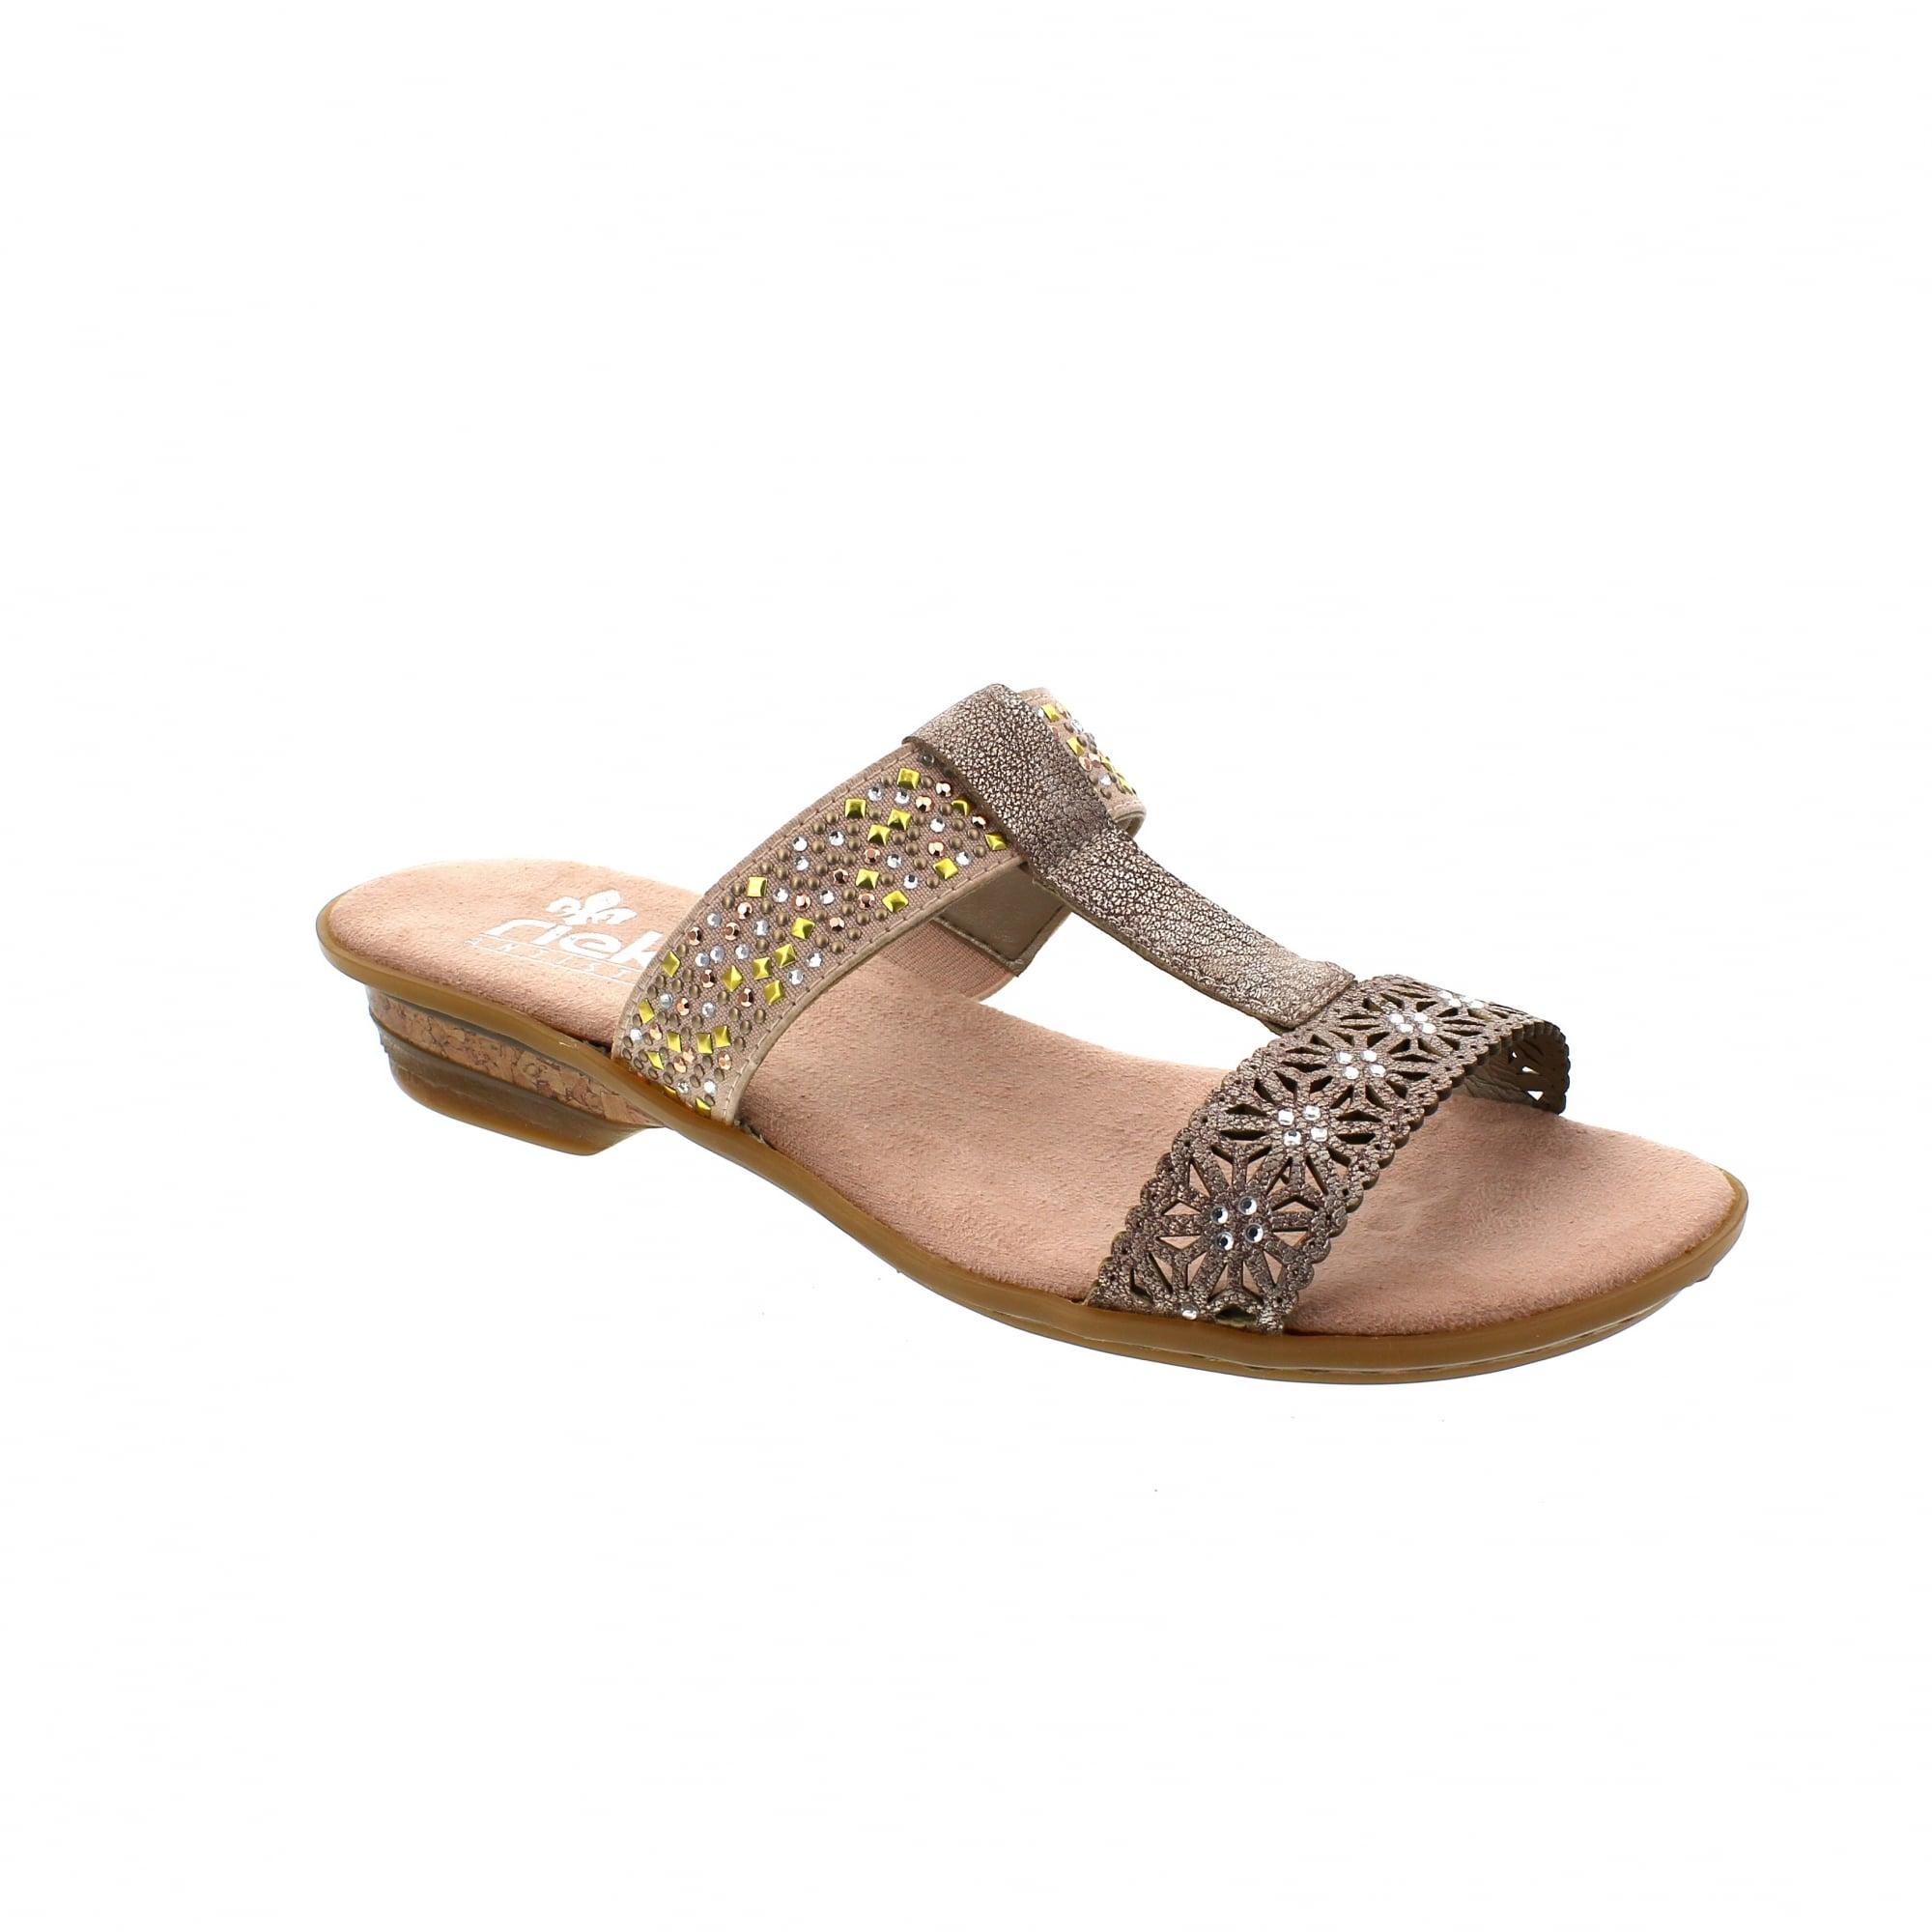 c572aebdda Rieker 63427-31 Pewter Print Womens Mule Sandals | Rogerson Shoes